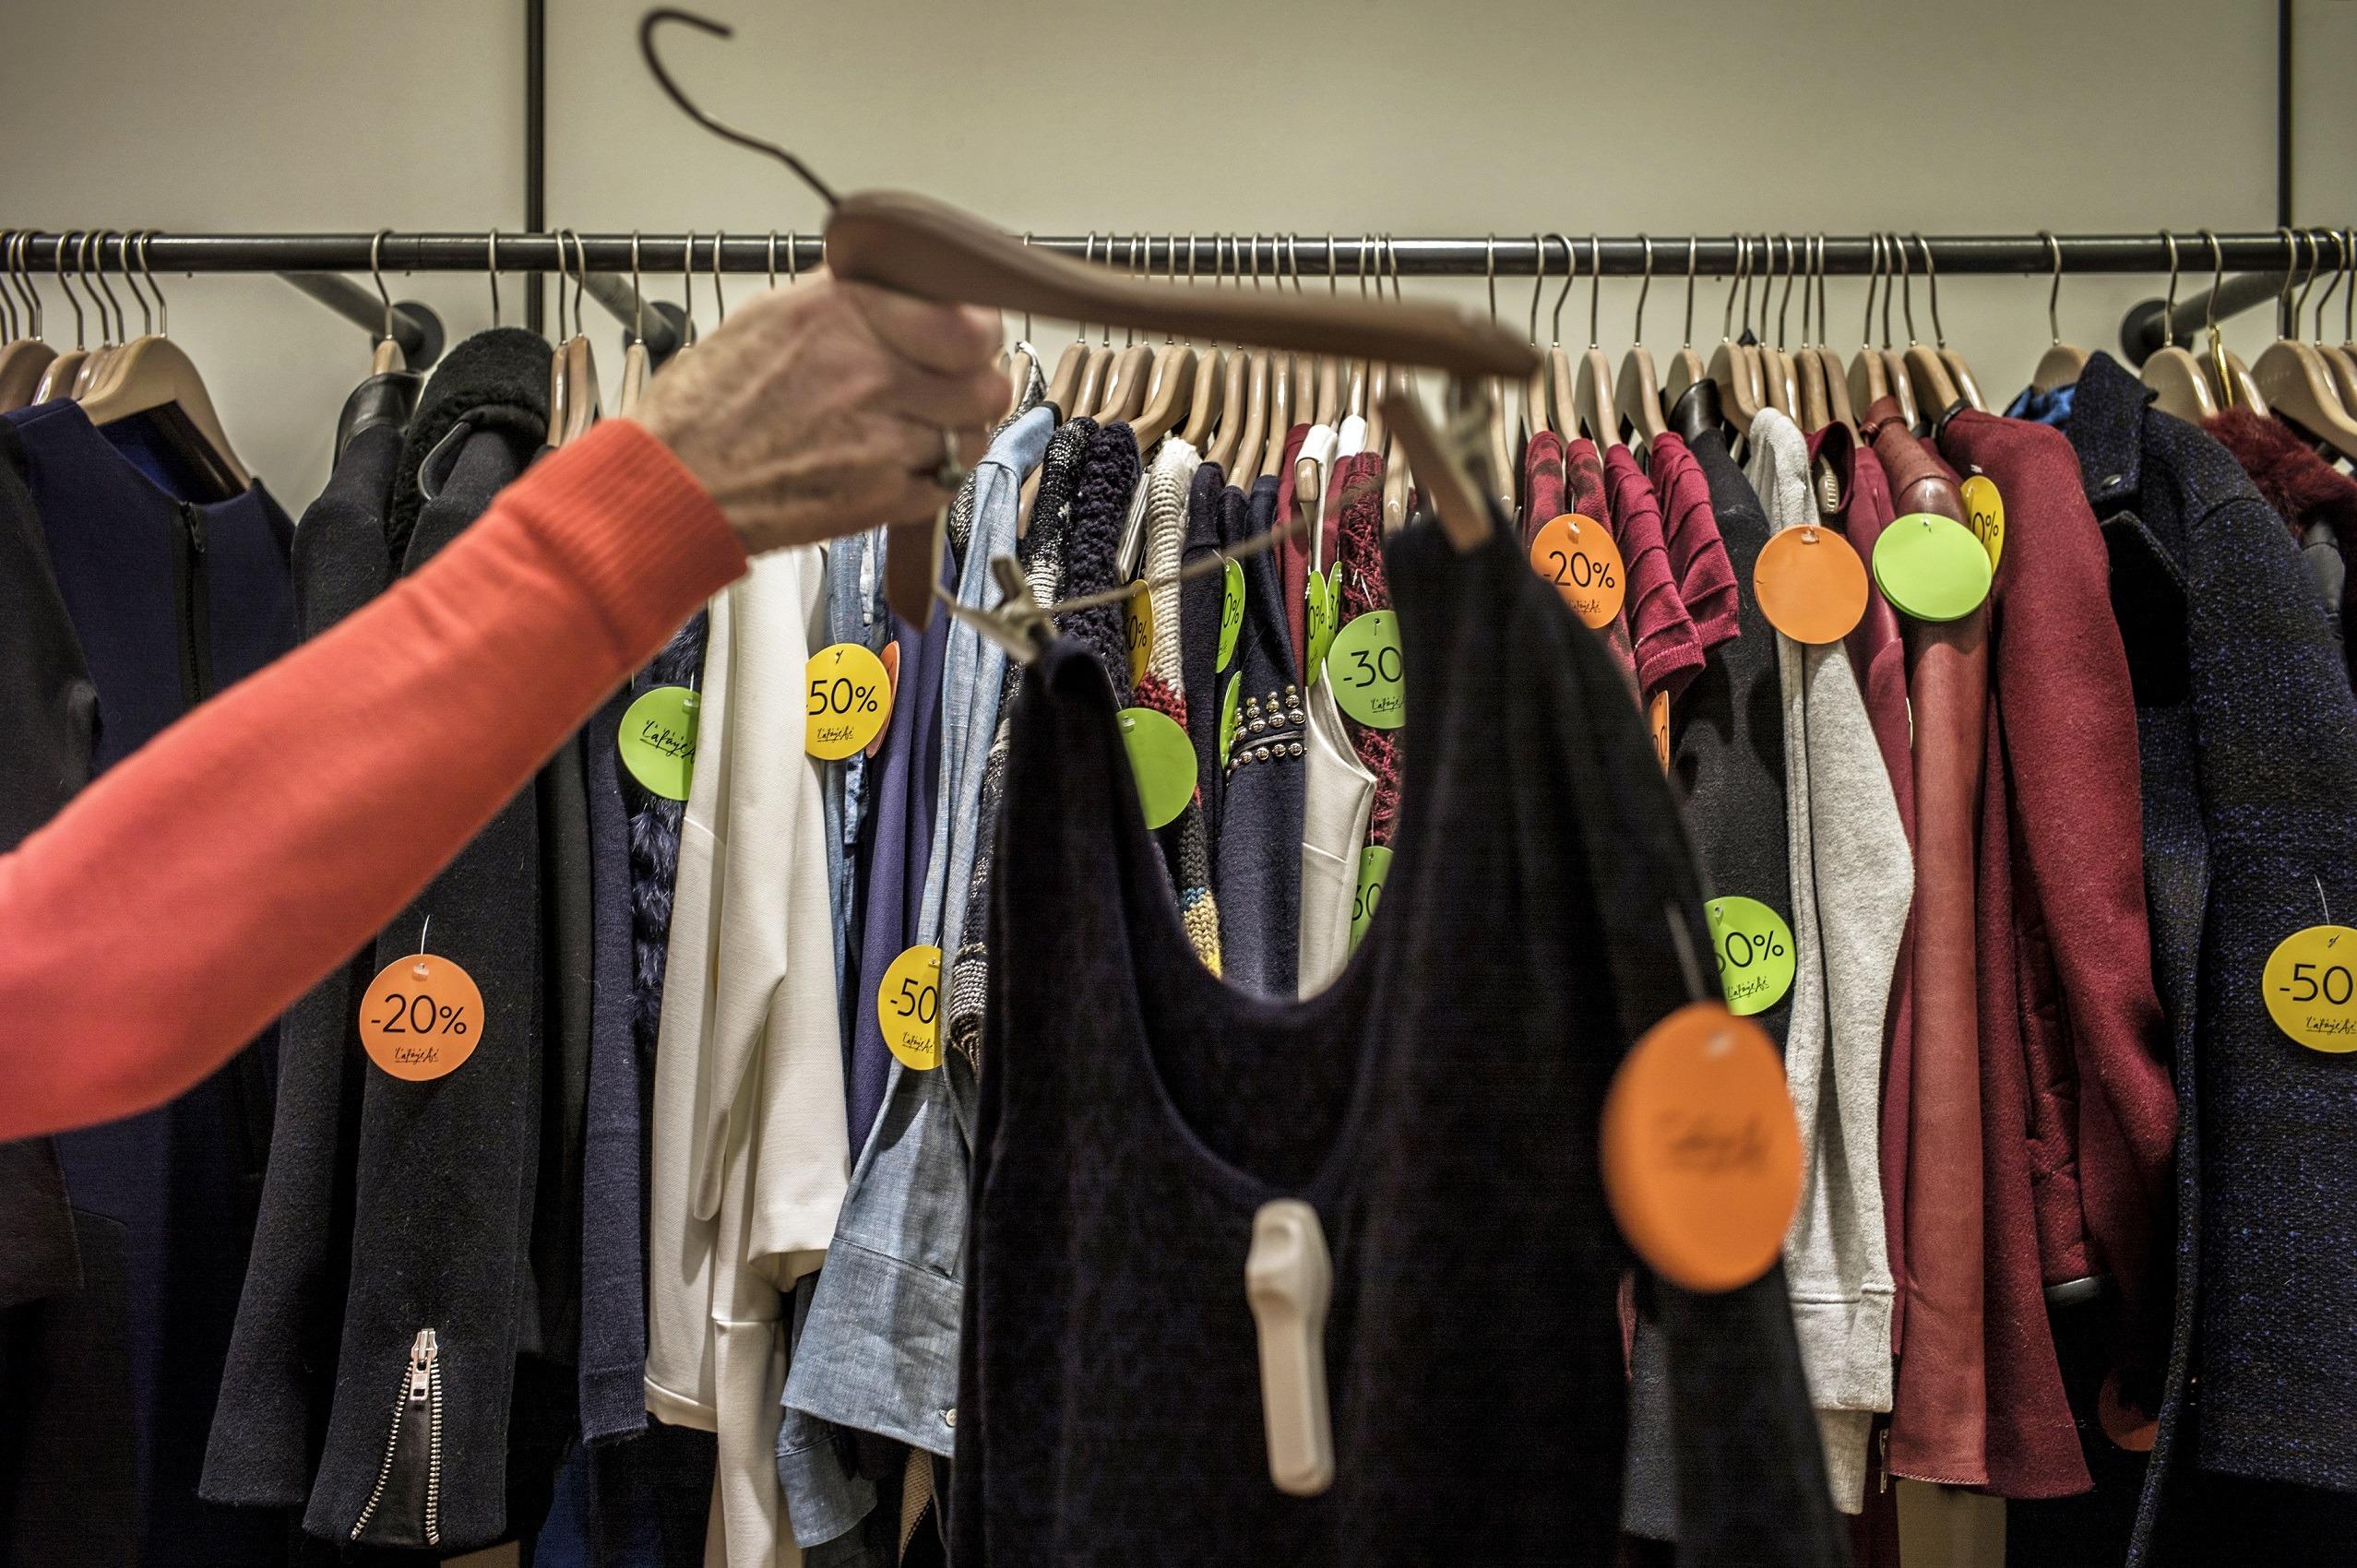 Clearance shopping rack